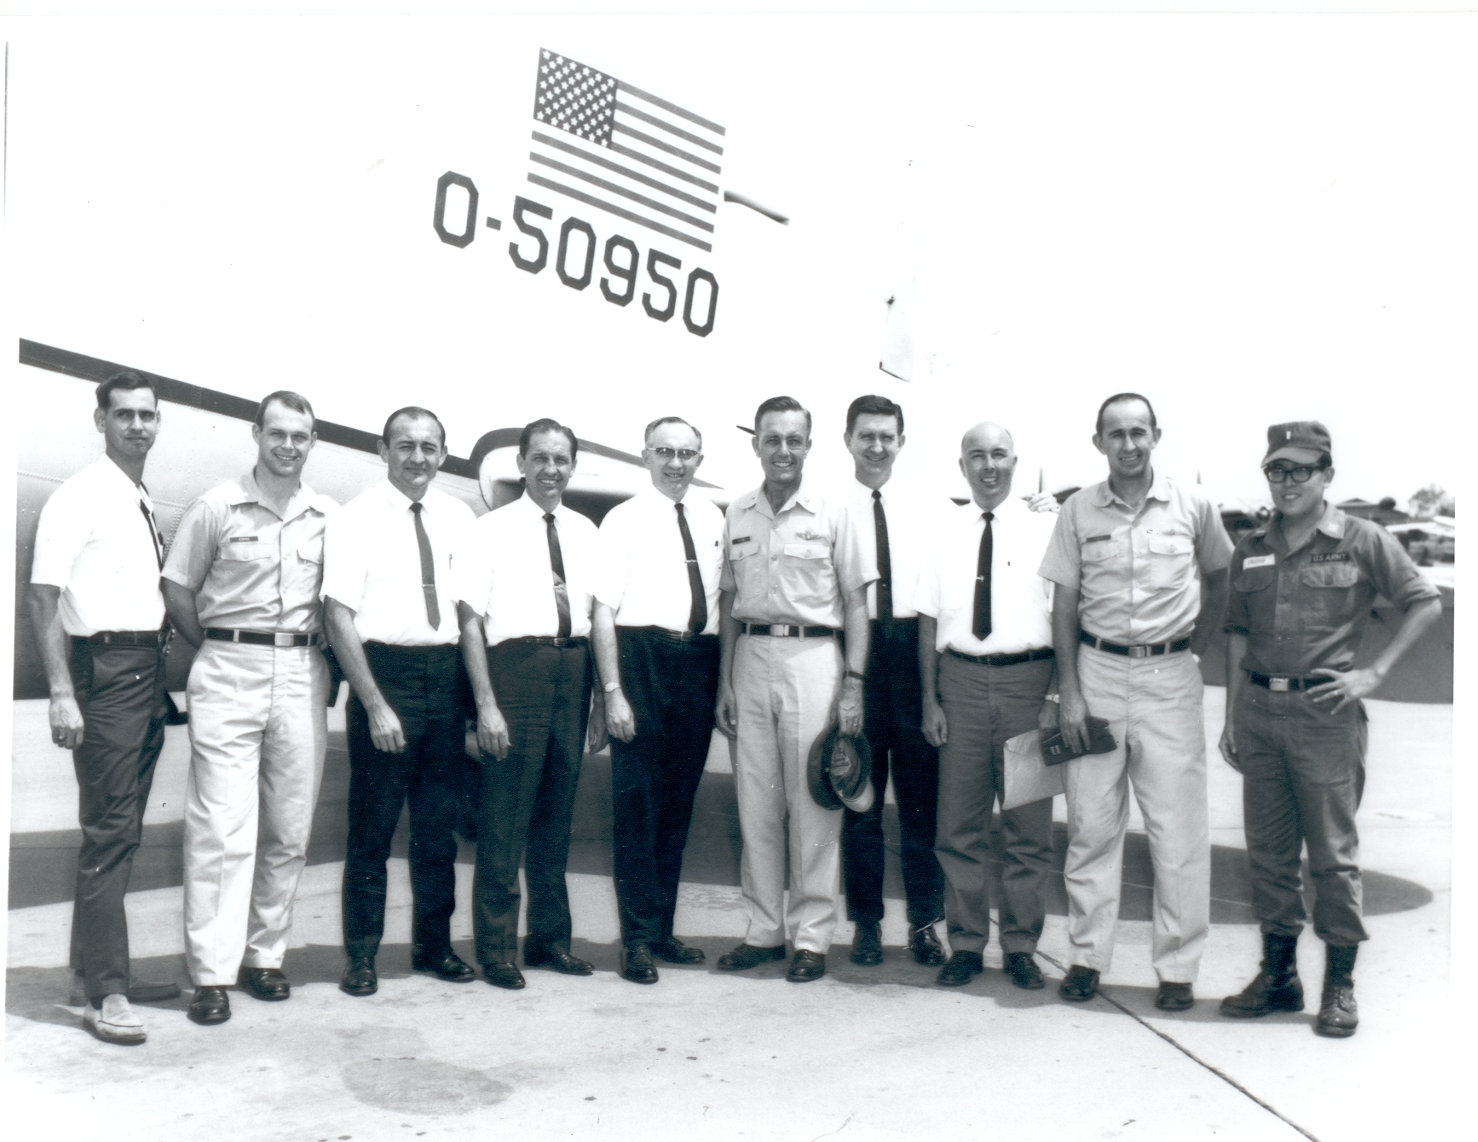 Then-Elder Gordon B. Hinkley visits Vietnam in 1966.